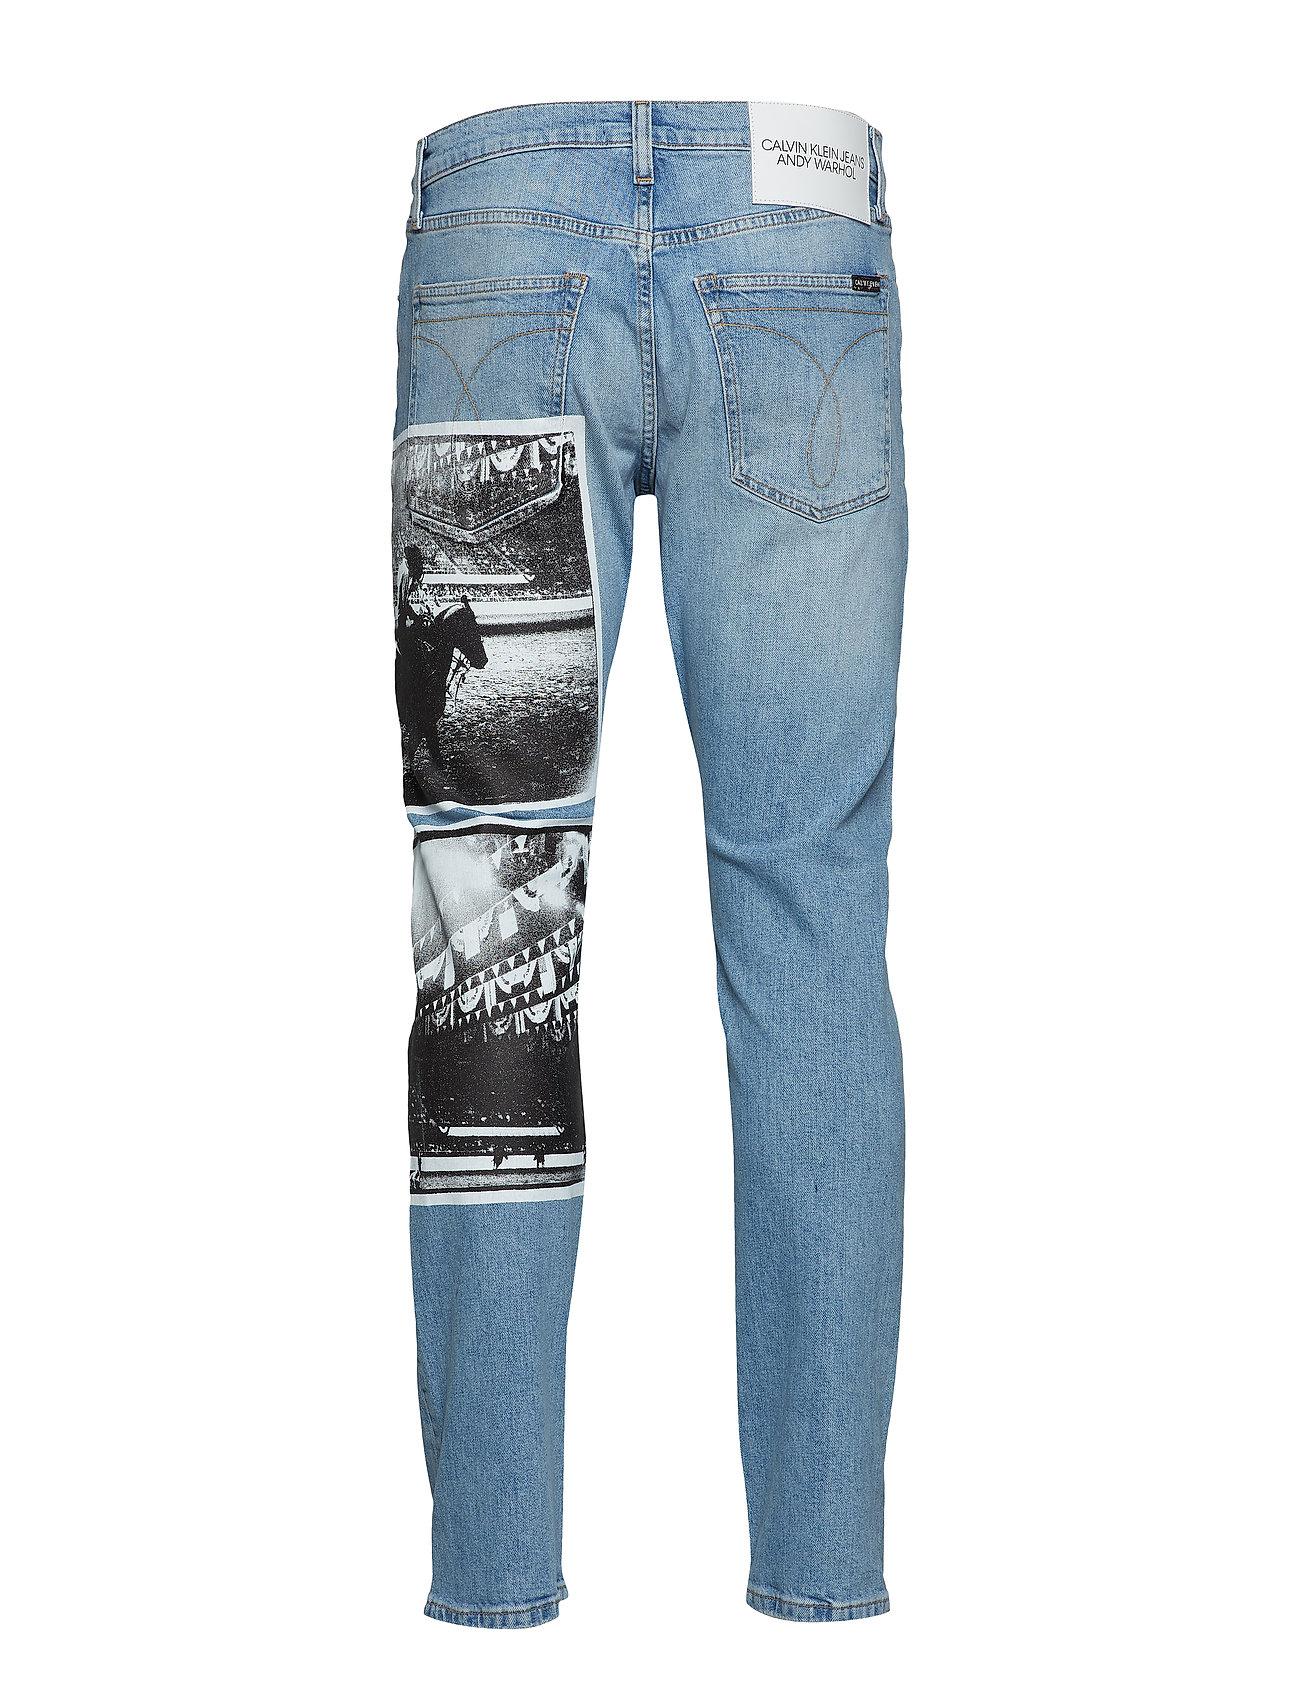 Jeans Ckj Klein 035 BlueCalvin Straightkind kOXiTZPu